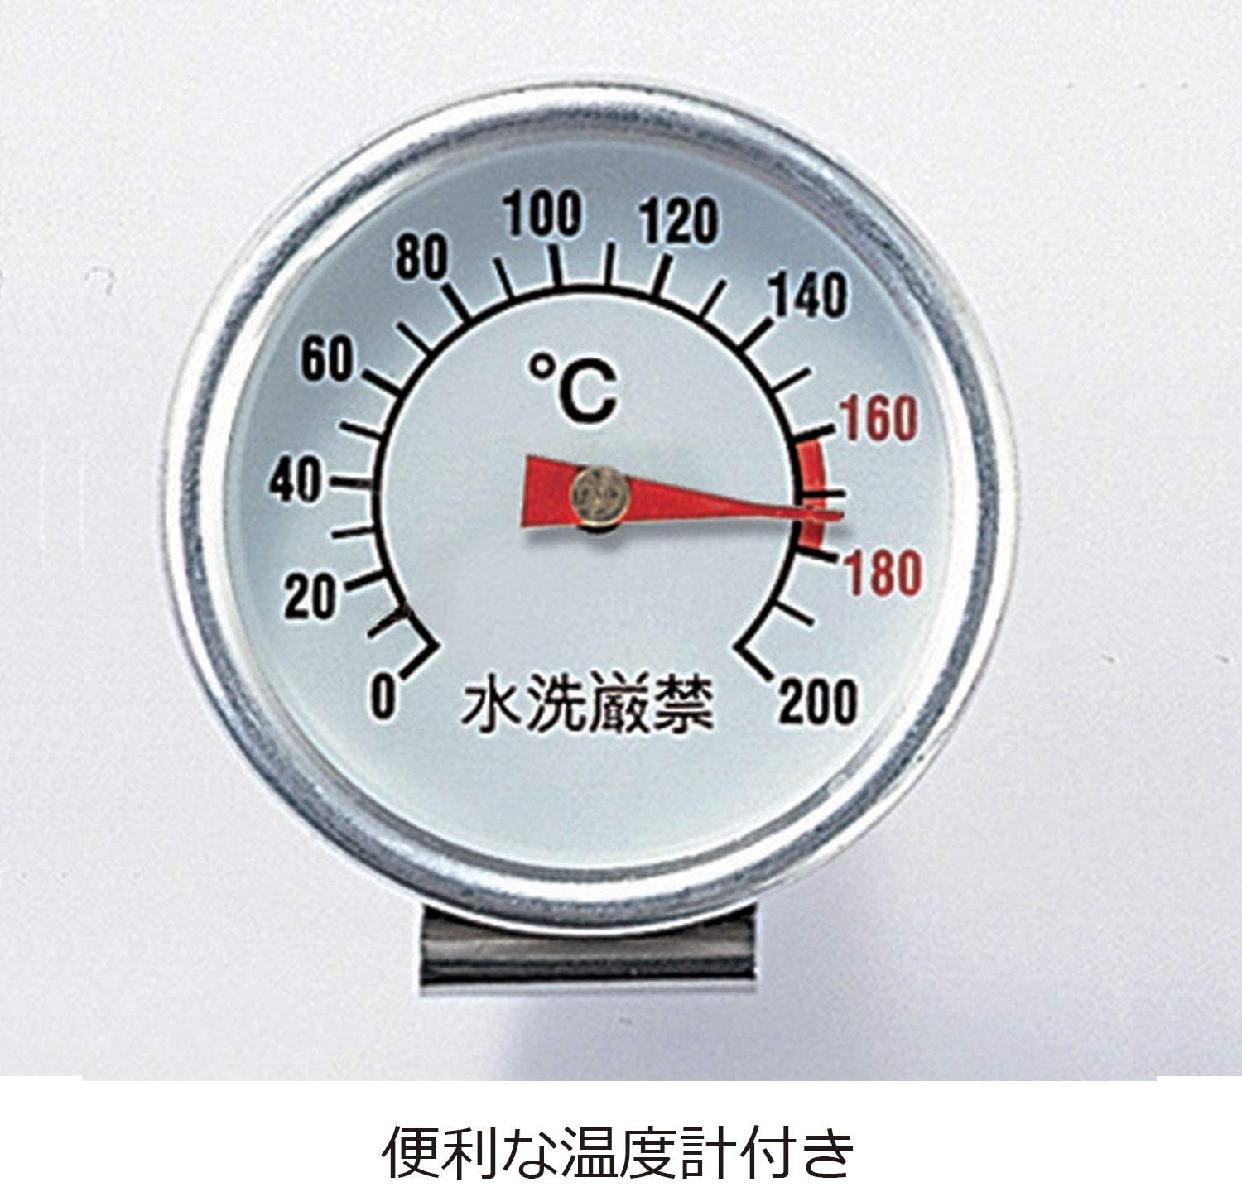 AUX(オークス) 日本製 IH対応 片付け簡単 天ぷら鍋セット オイルポット 温度計付 シルバー T23の商品画像6